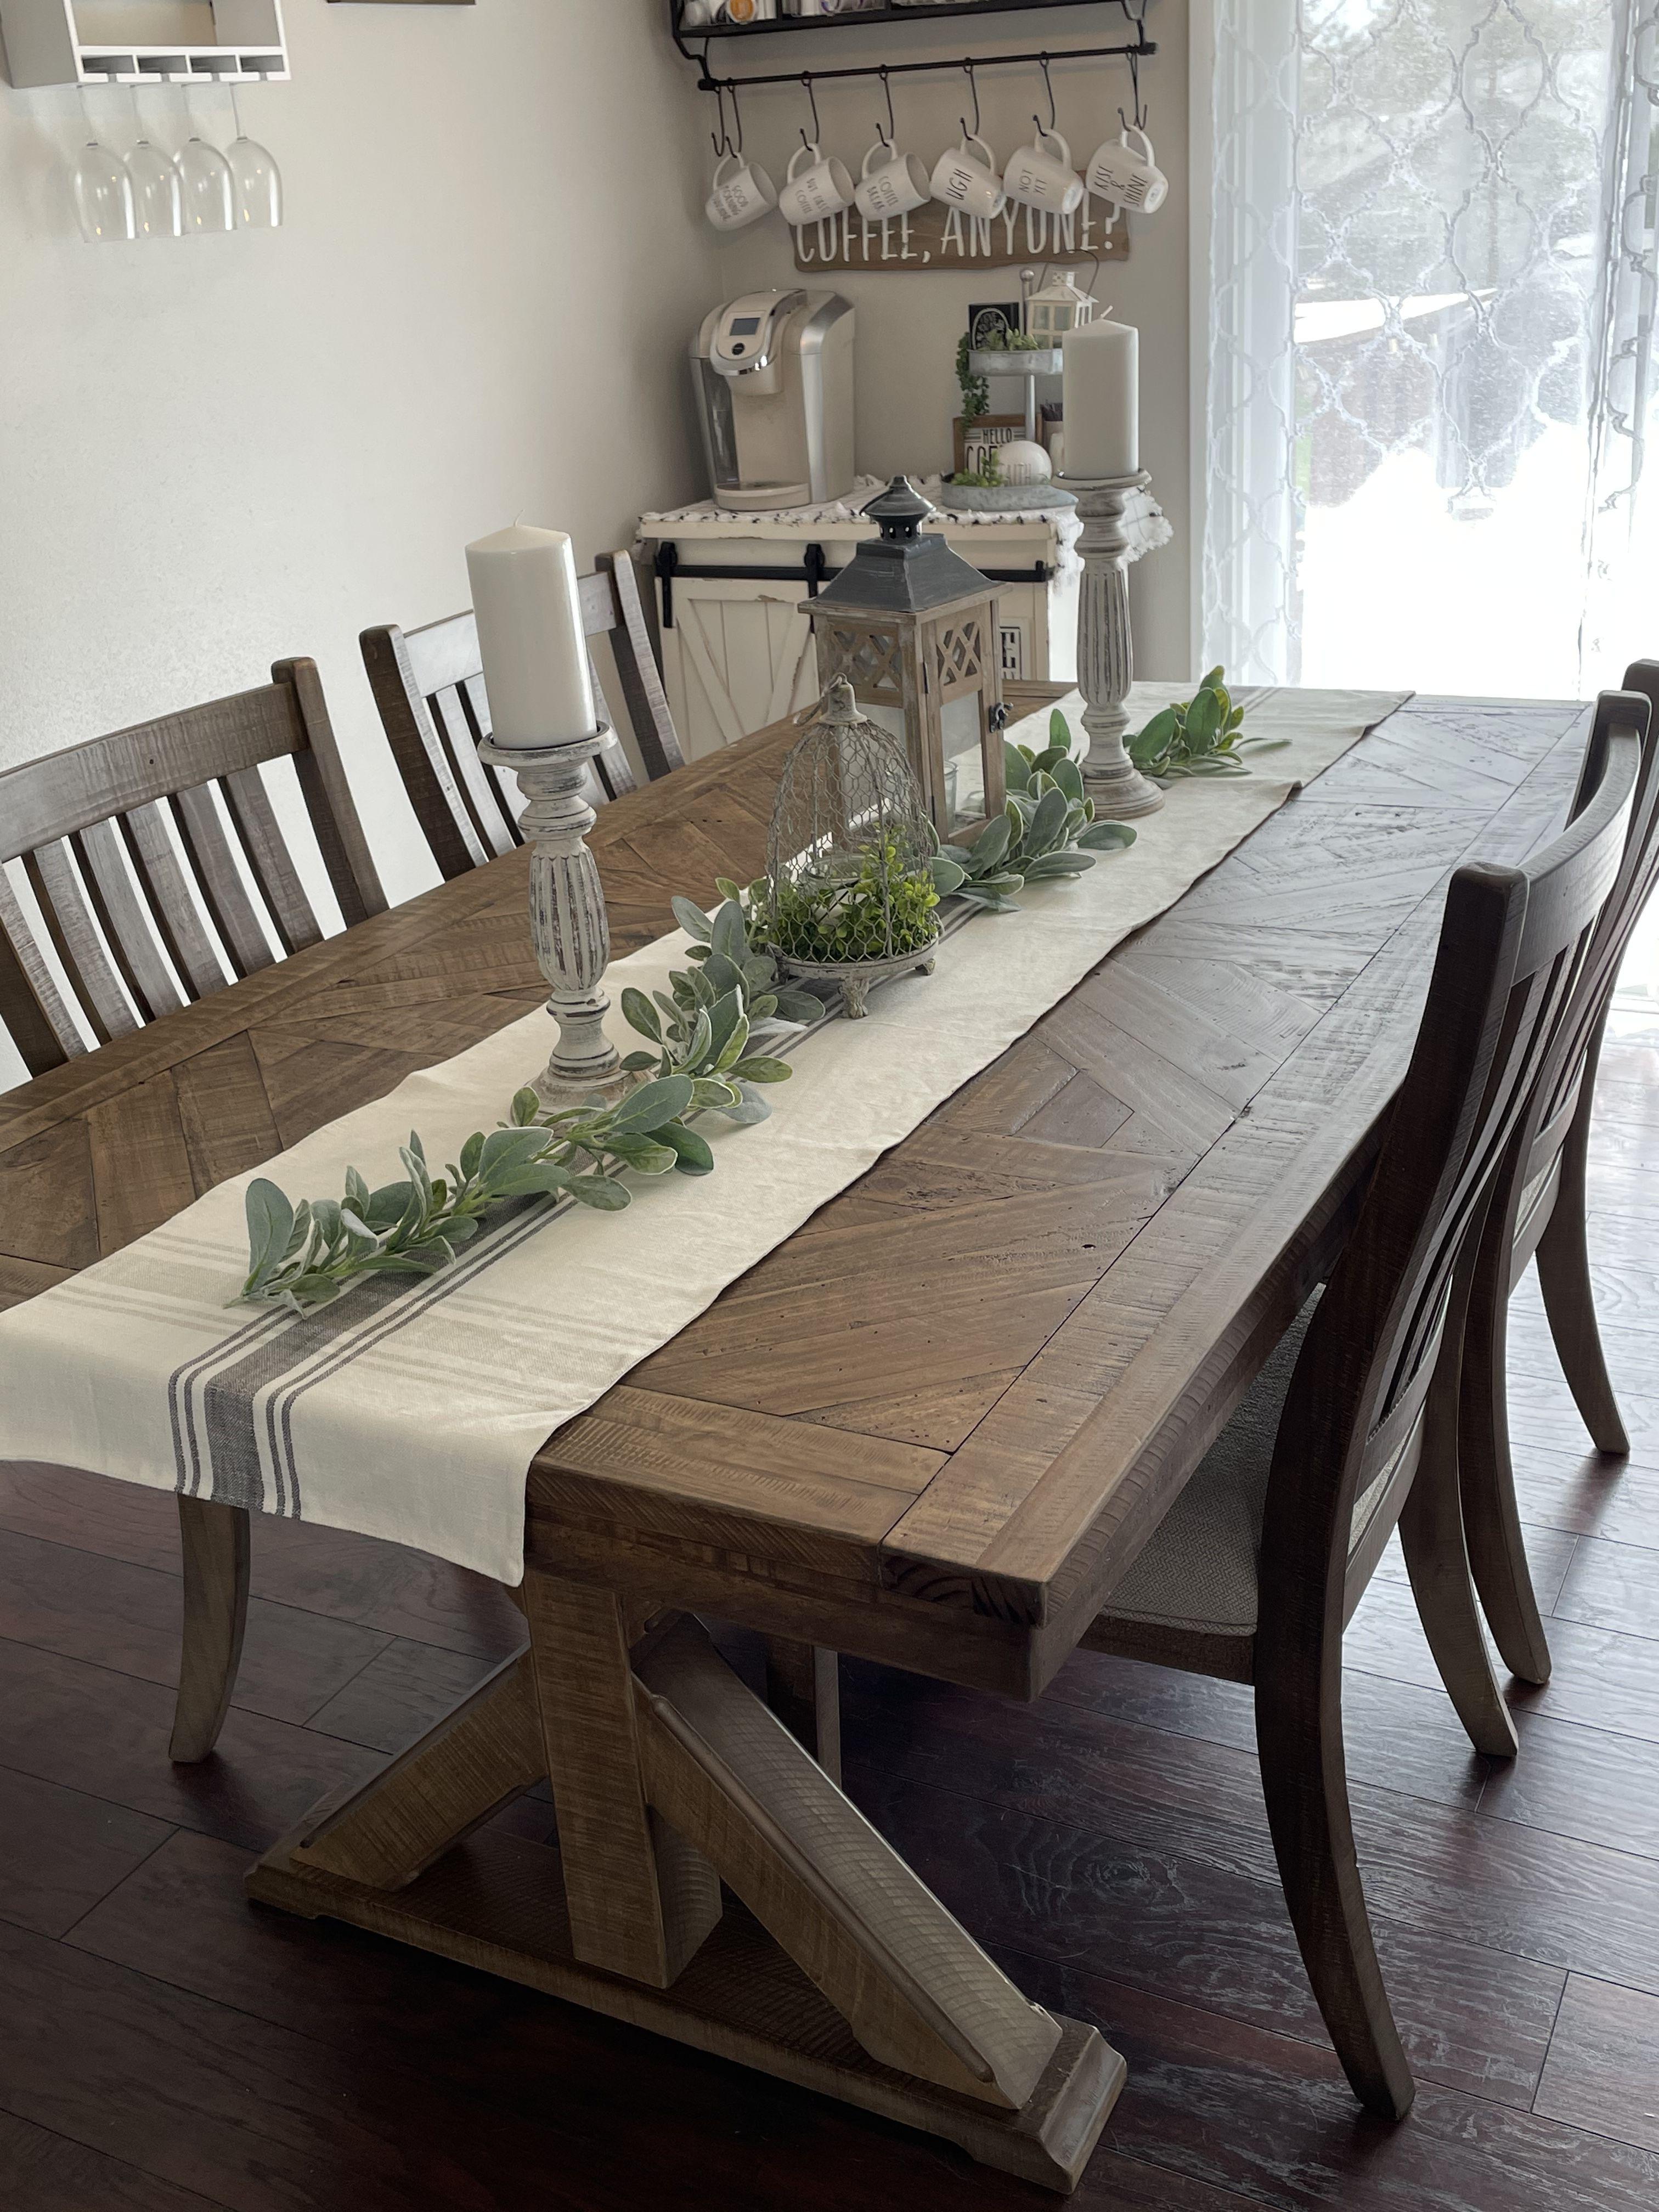 Grindleburg Dining Table | Ashley Furniture HomeStore